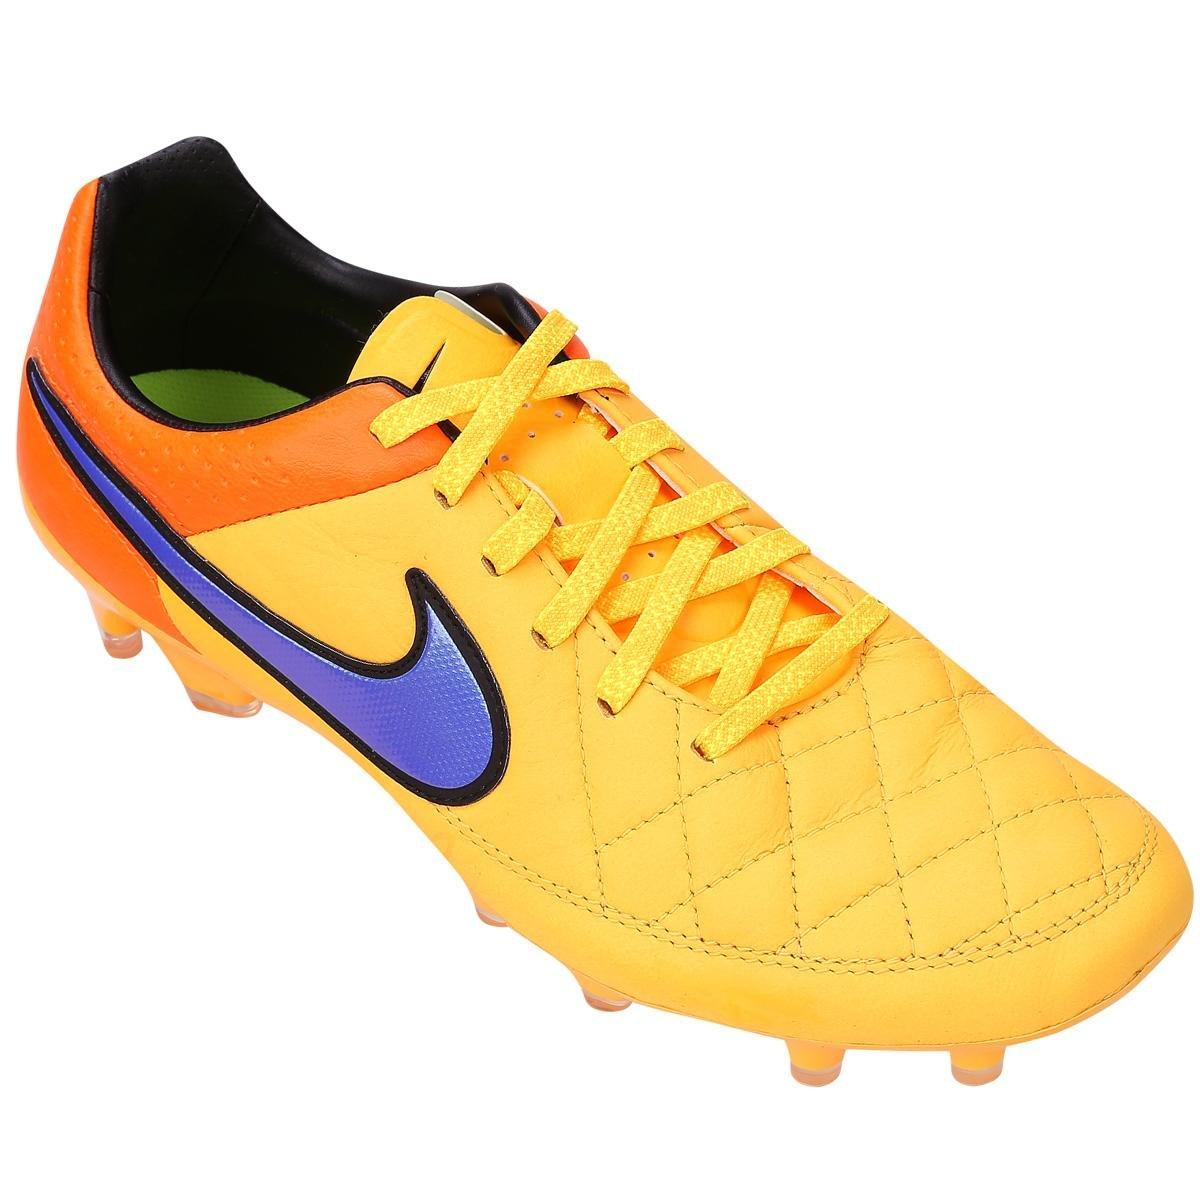 a7f59f73711b6 Chuteira Nike Tiempo Legacy FG - Compre Agora